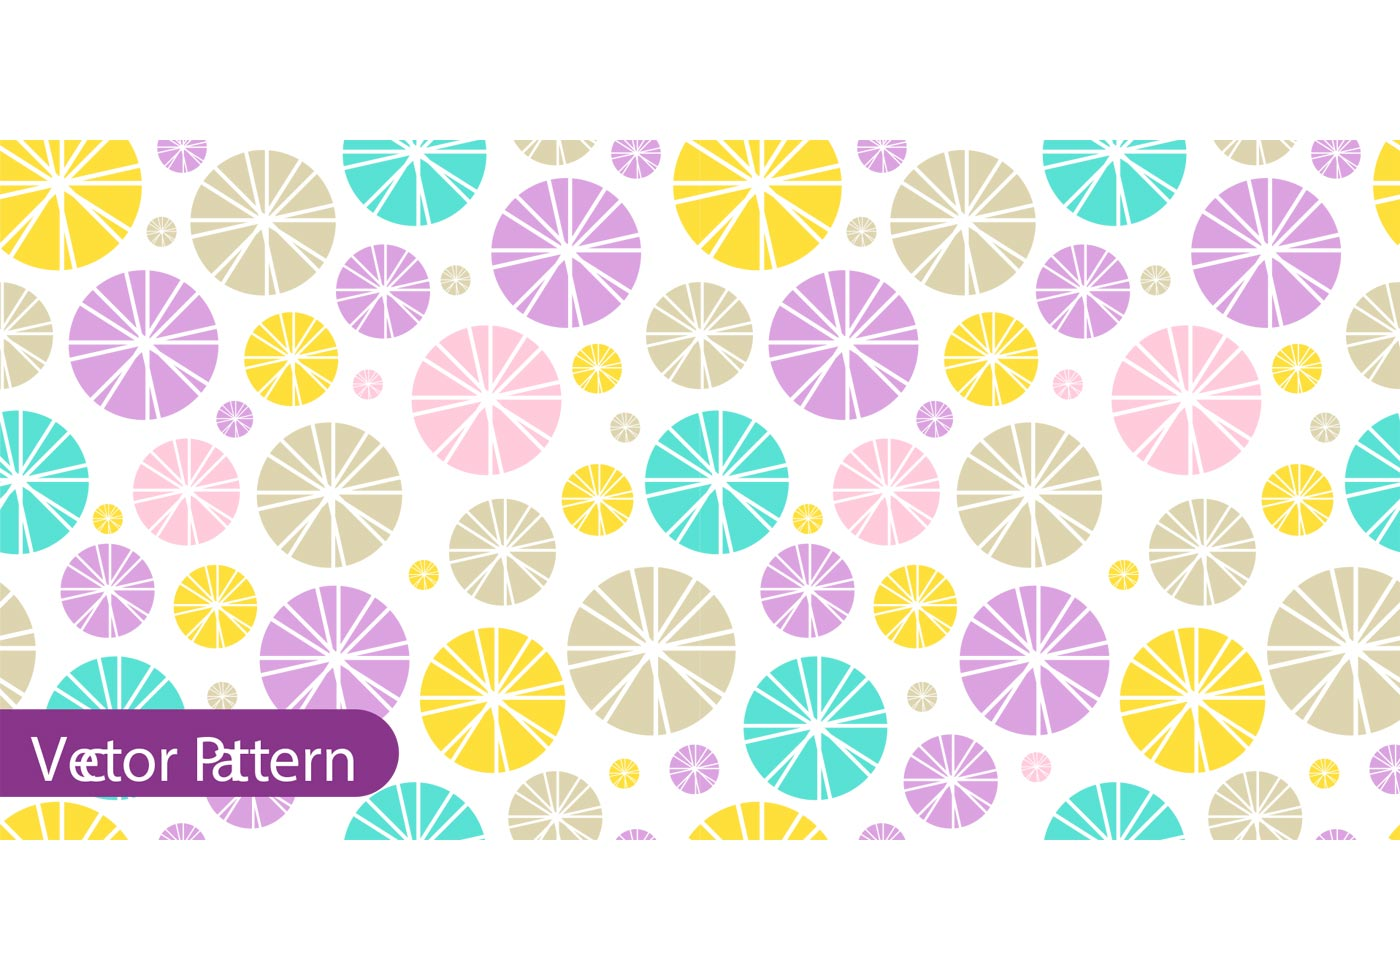 Cute Circle Wallpaper Colorful Retro Pattern Vector Download Free Vector Art